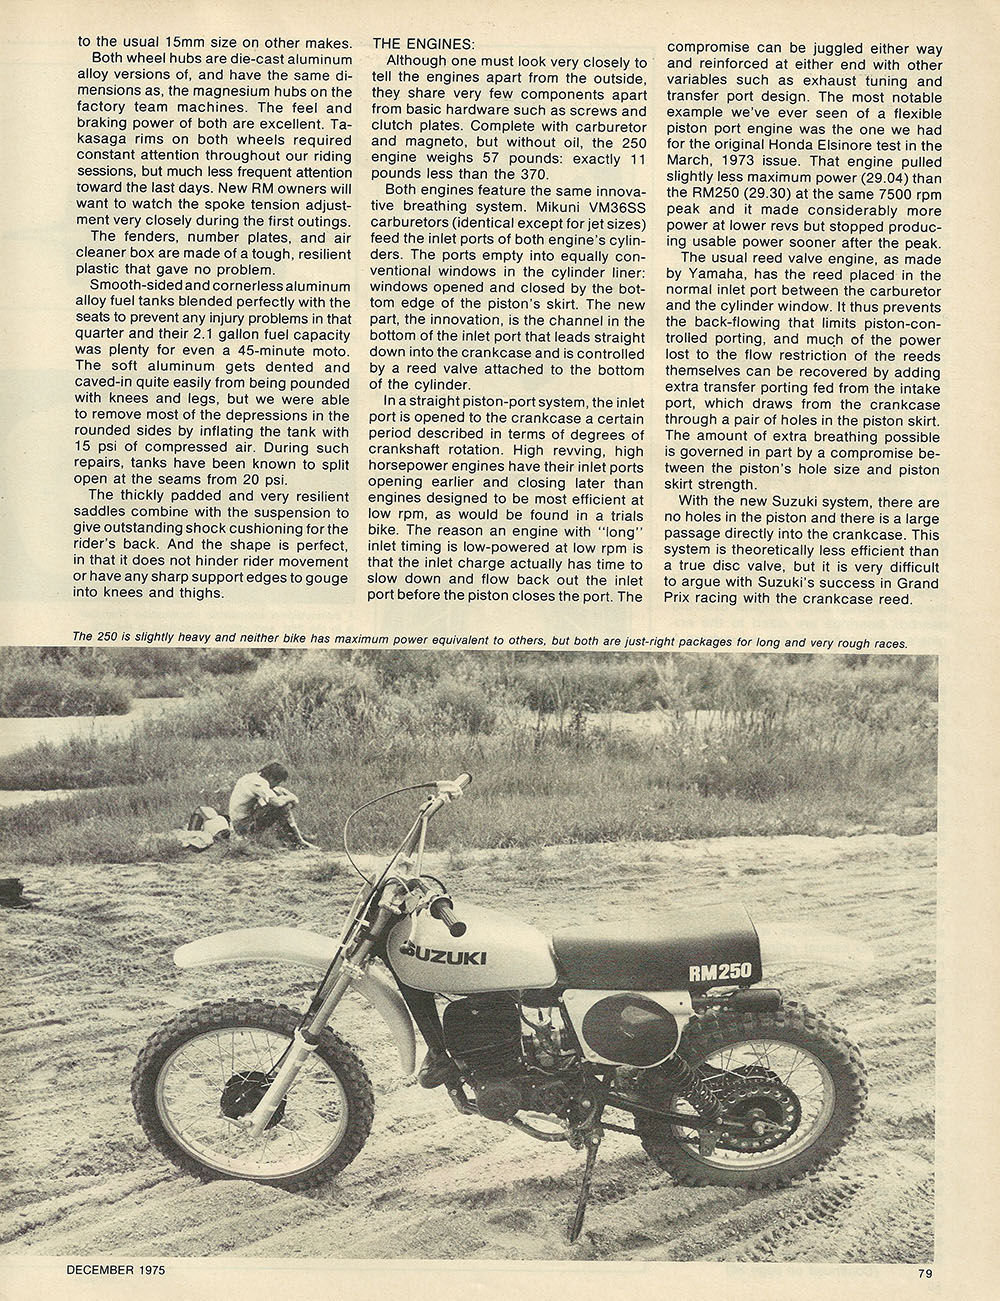 1975 Suzuki RM250 and RM370 off road test 3.JPG